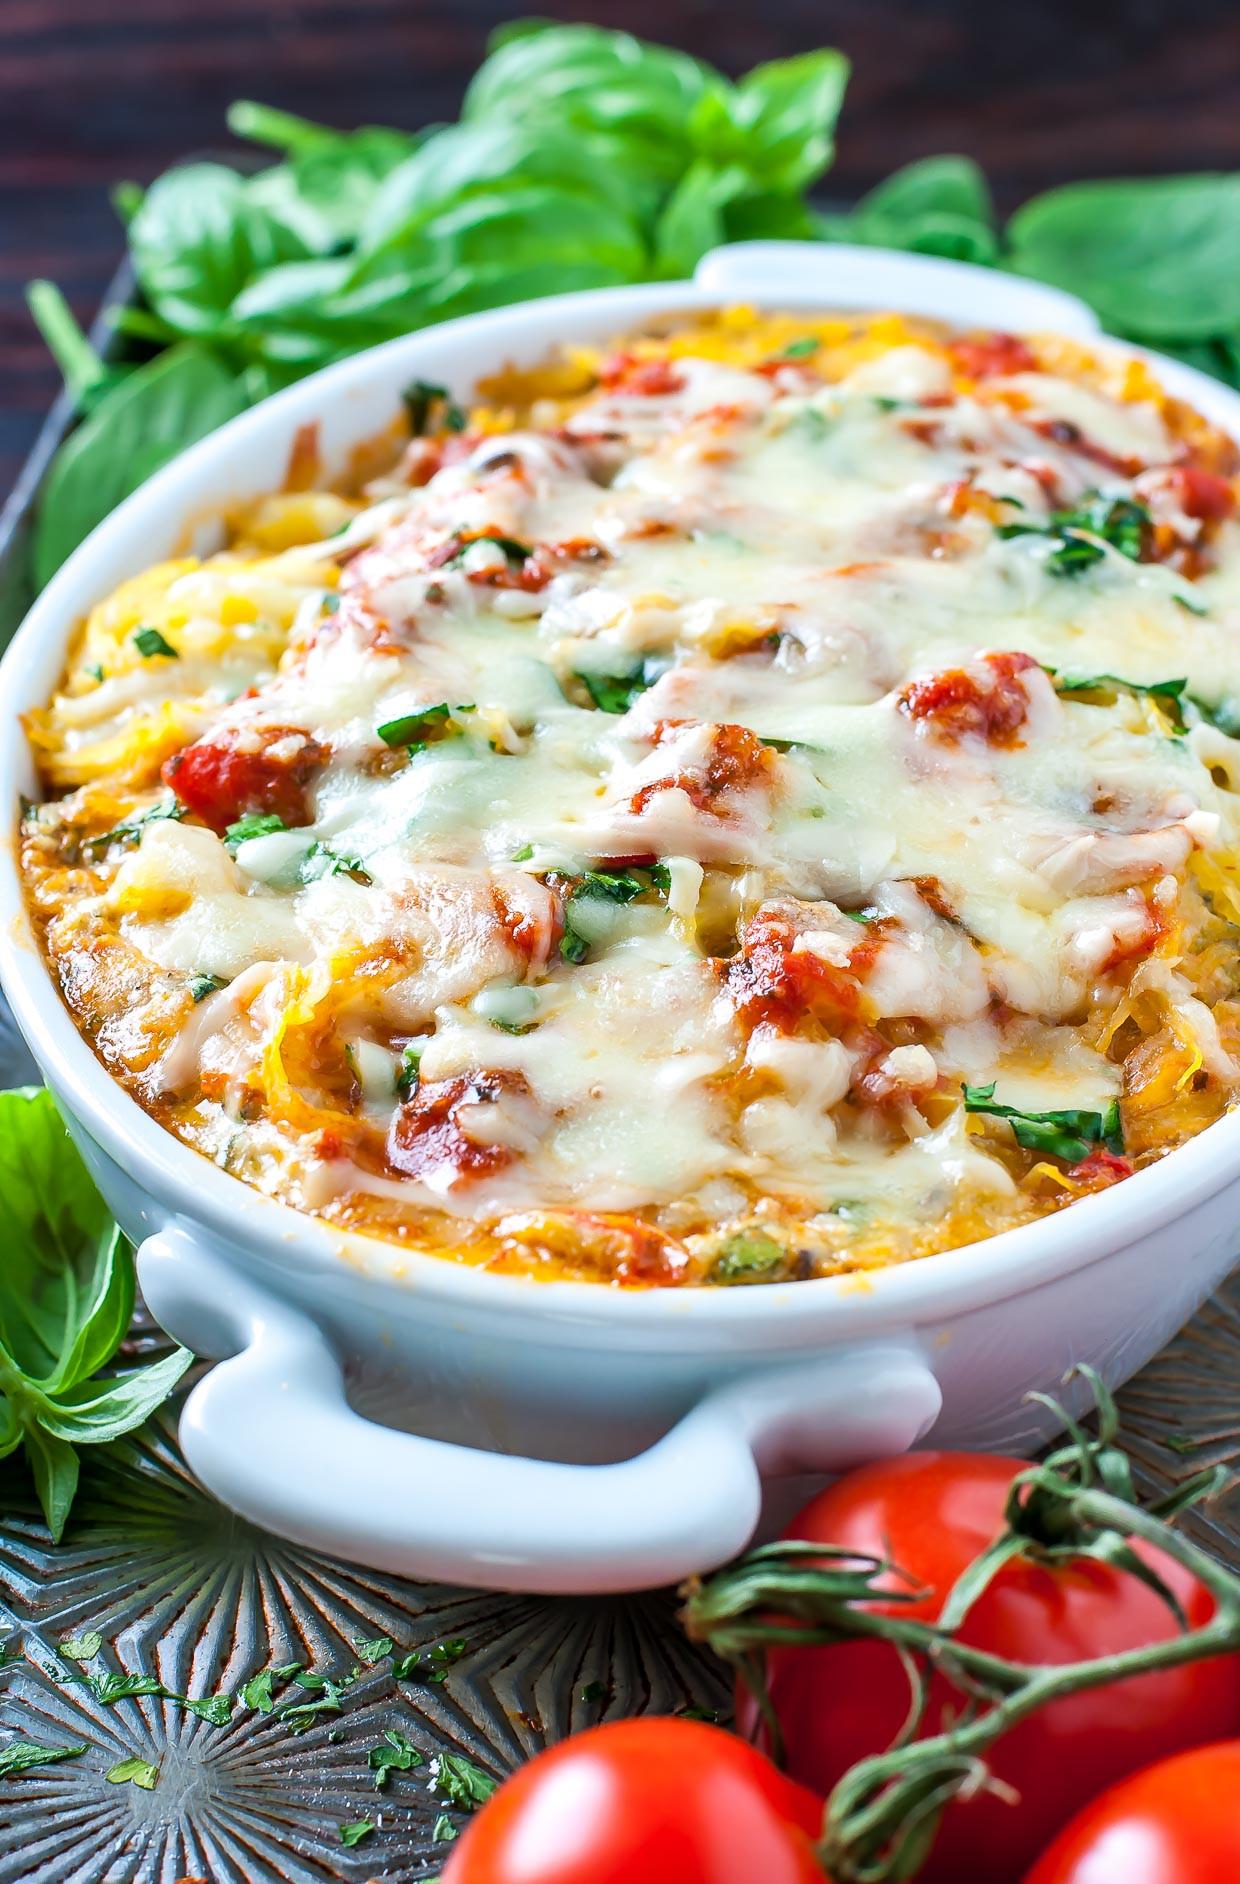 Bake Vegetarian Recipes  healthy baked spaghetti squash casserole